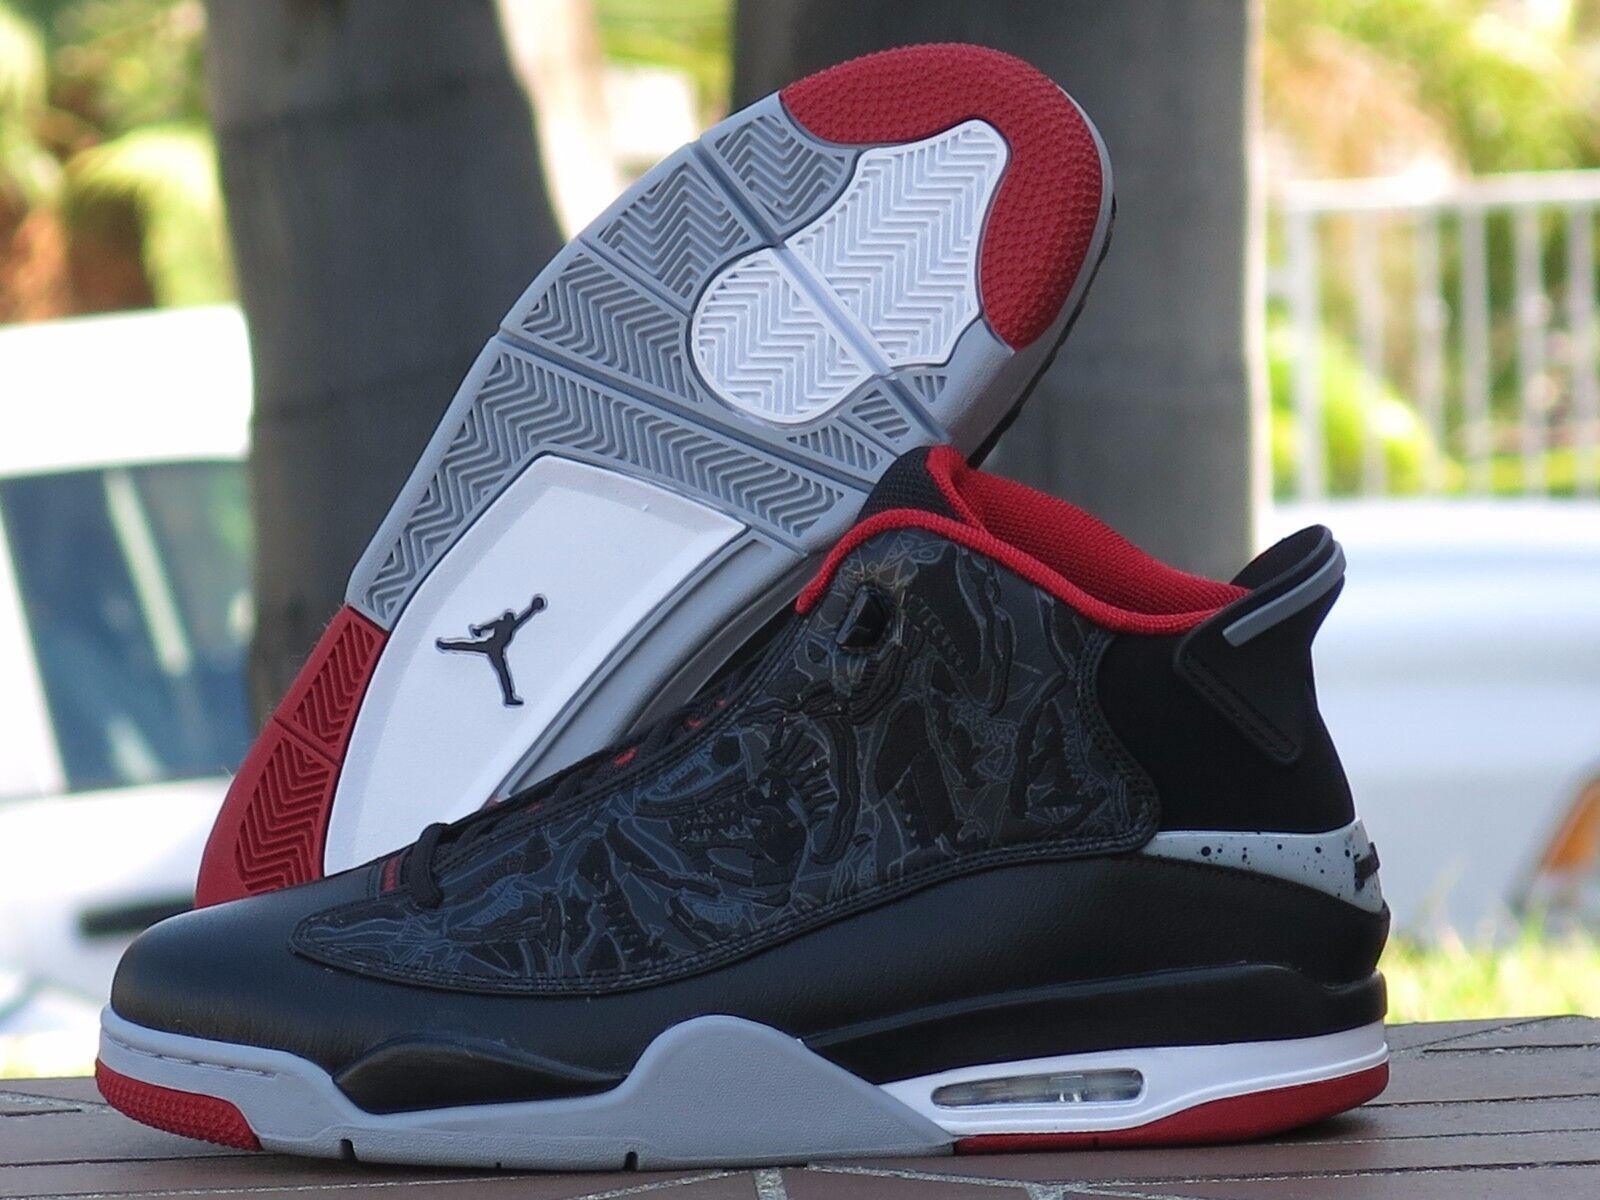 Nike Air Jordan Dub Zero Men's Athletic Fashion Sneakers 311046 013 SZ 13